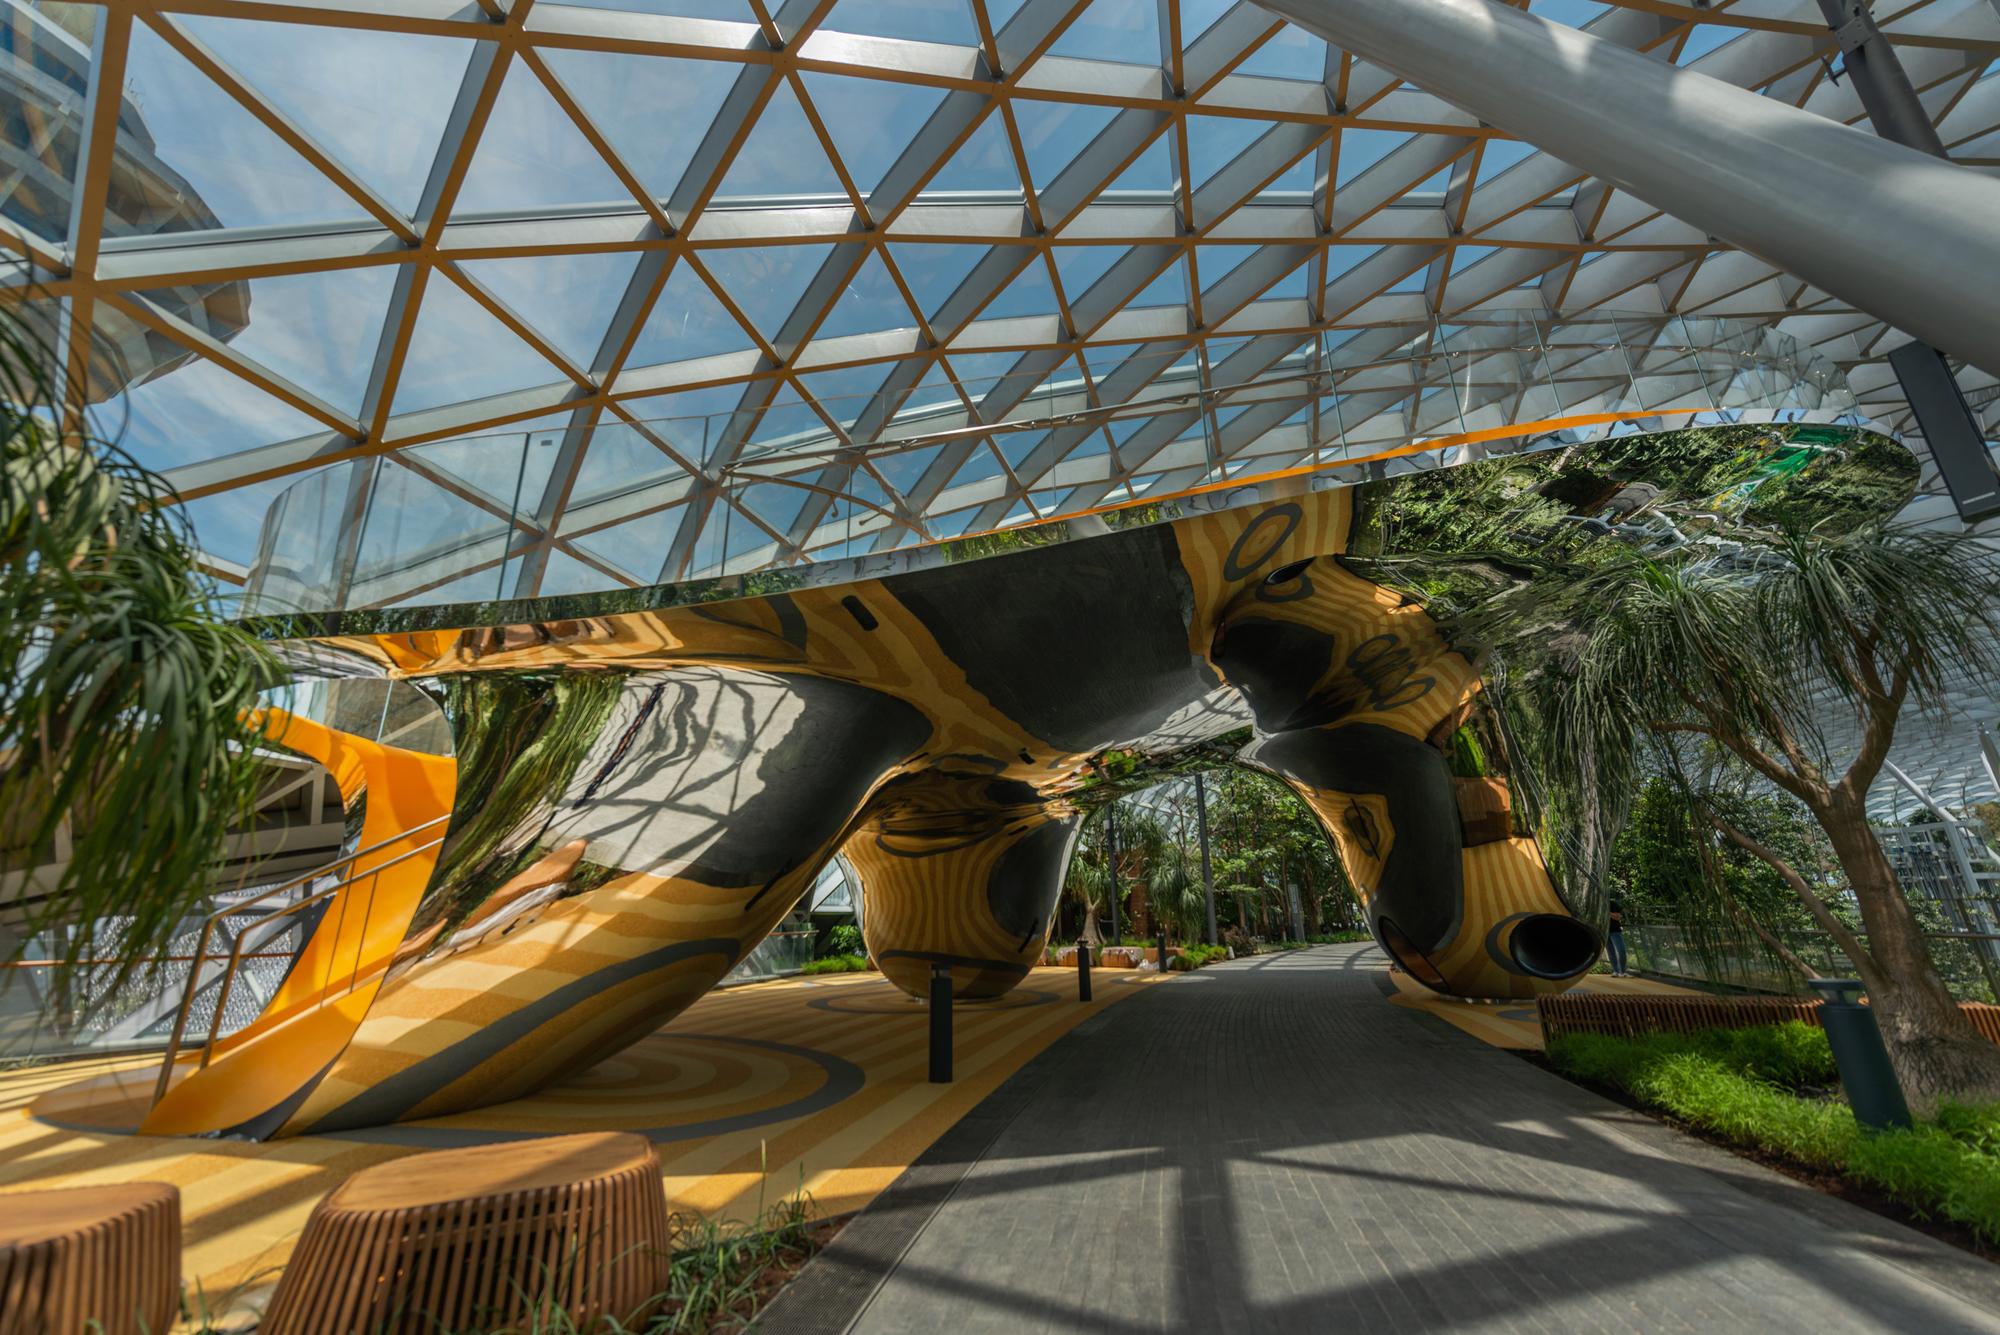 Galeria de Aeroporto Jewel Changi / Safdie Architects - 8